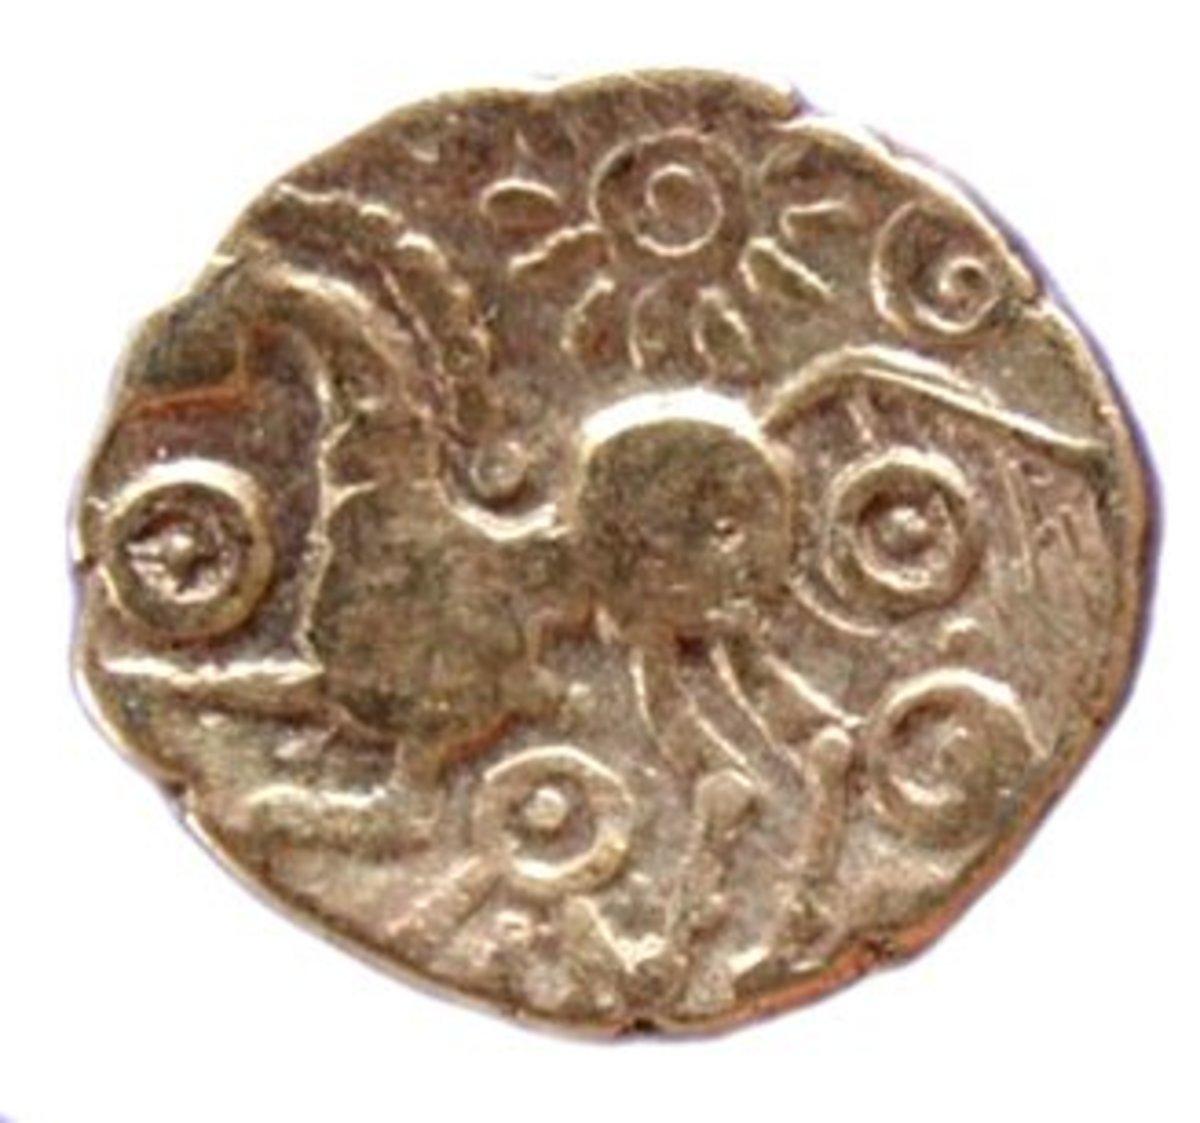 Belgae coin